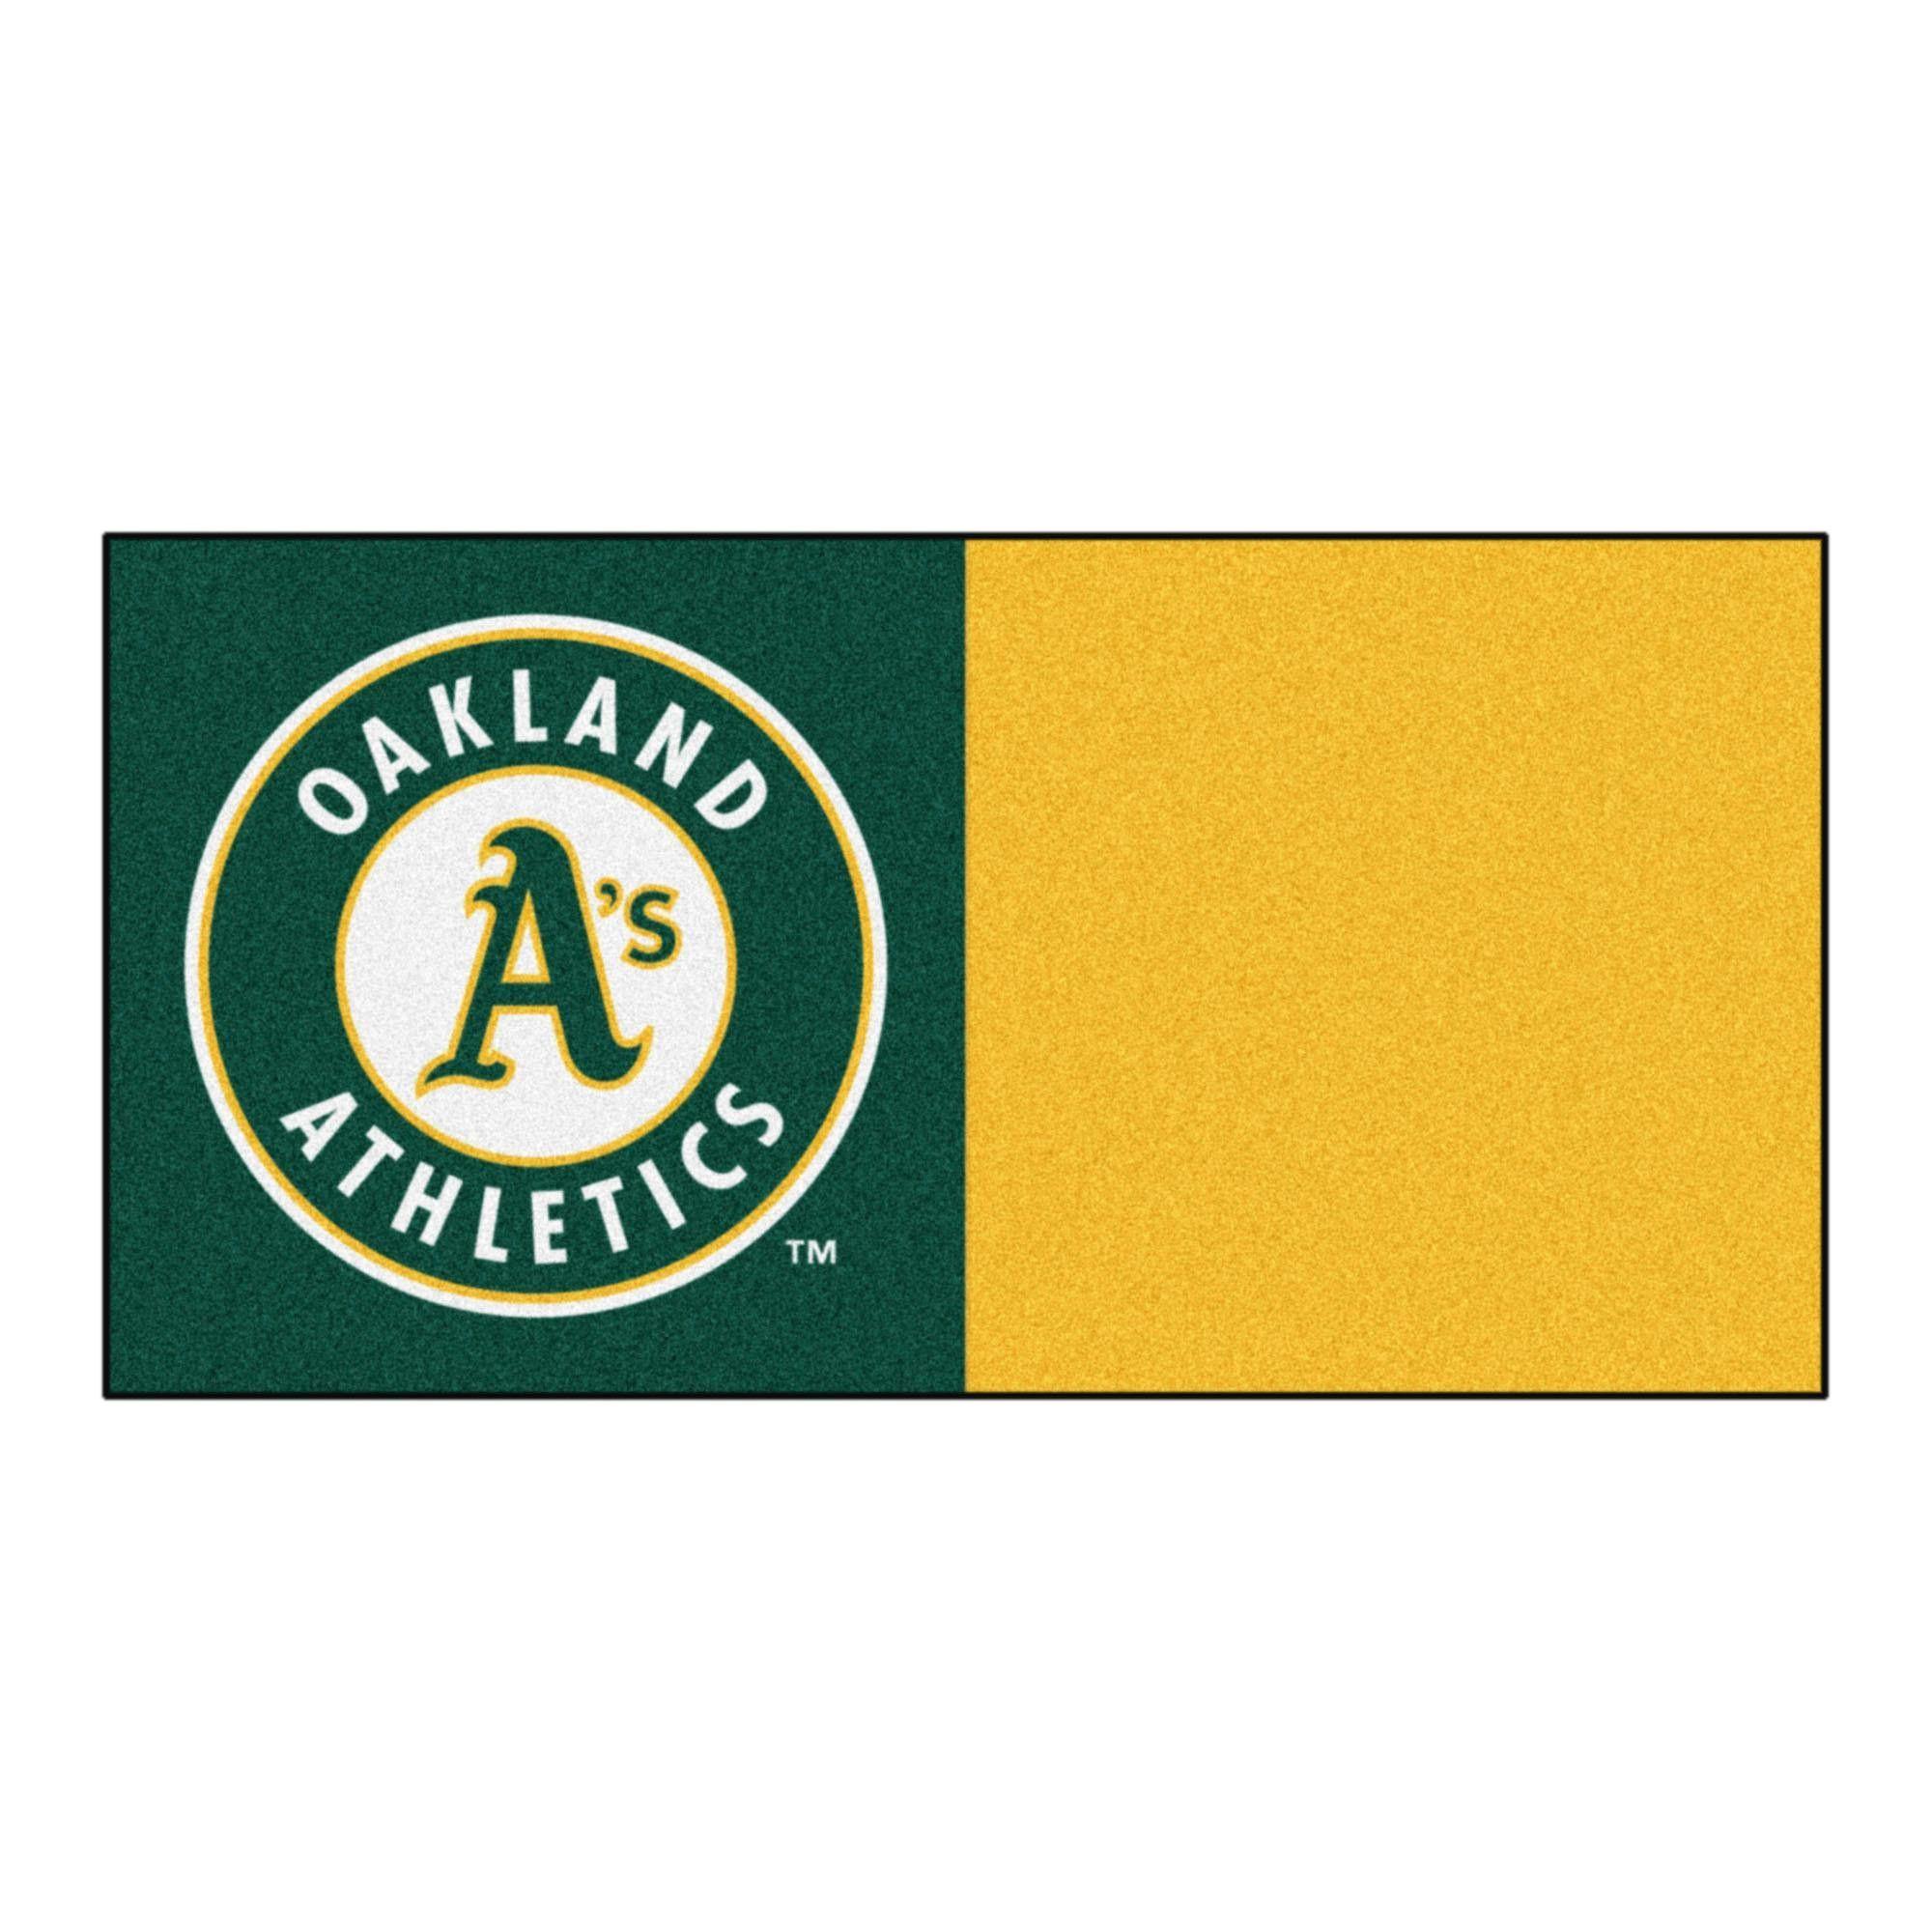 Oakland Athletics Carpet Tiles 18x18 tiles